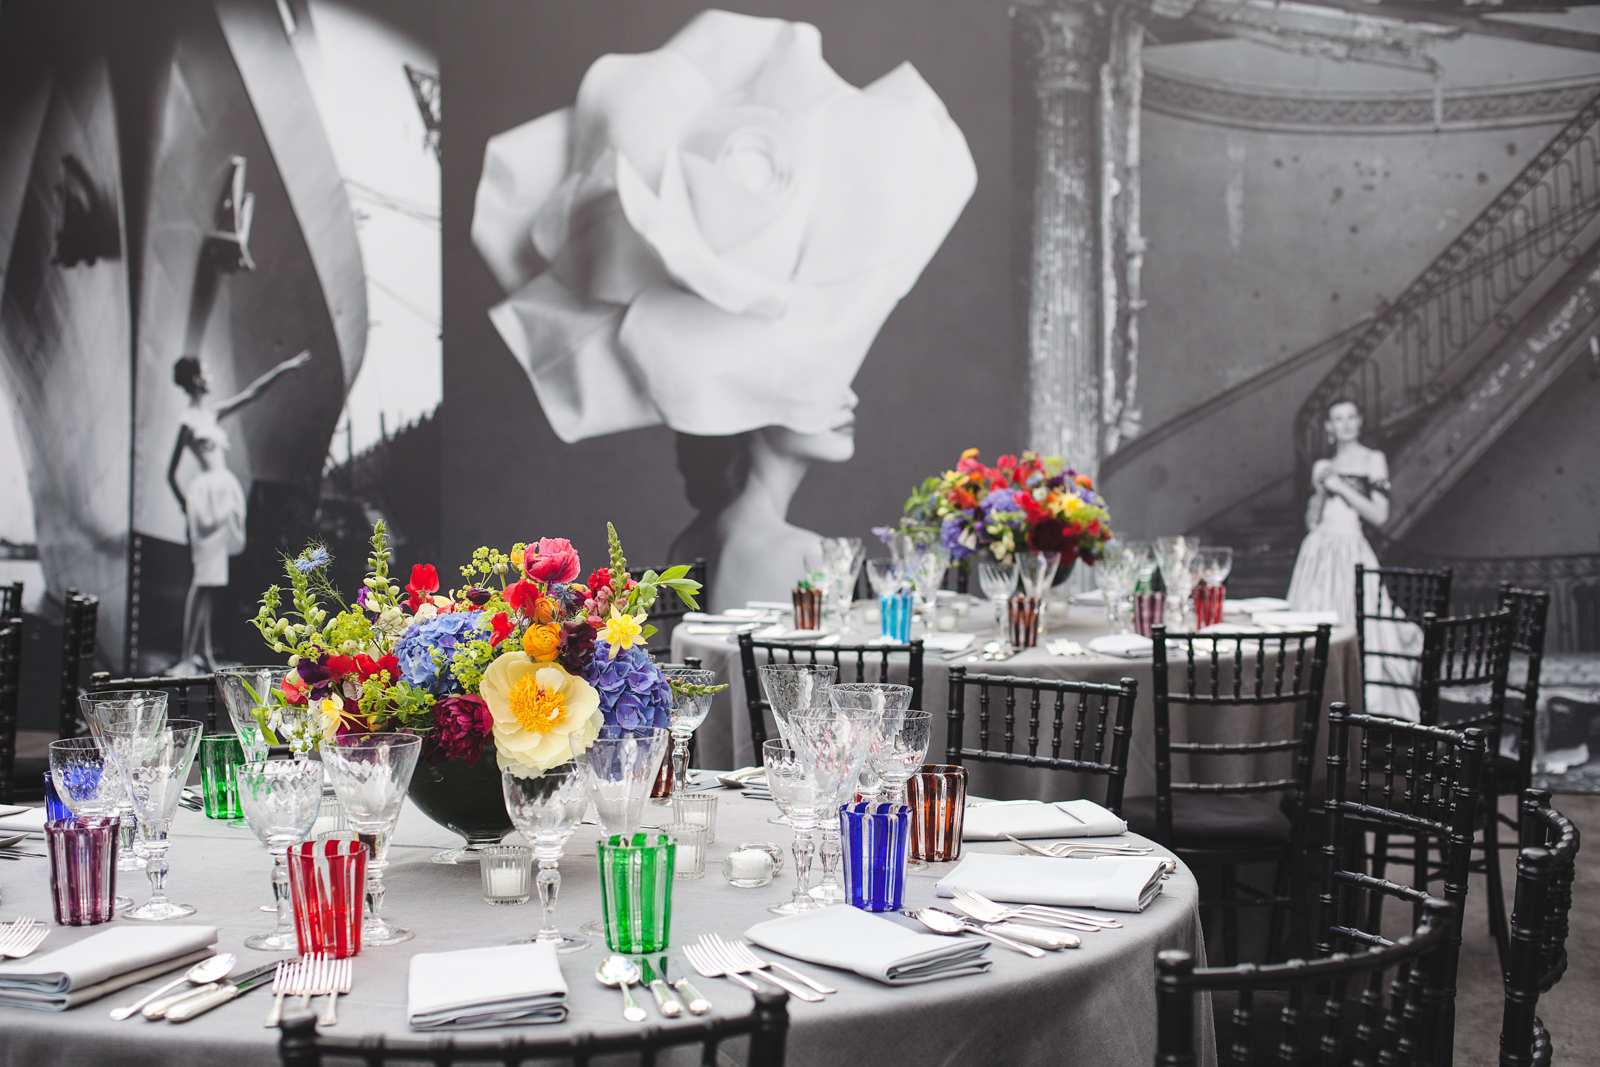 Vogue 100 Dinner (Low Res)-1.JPG